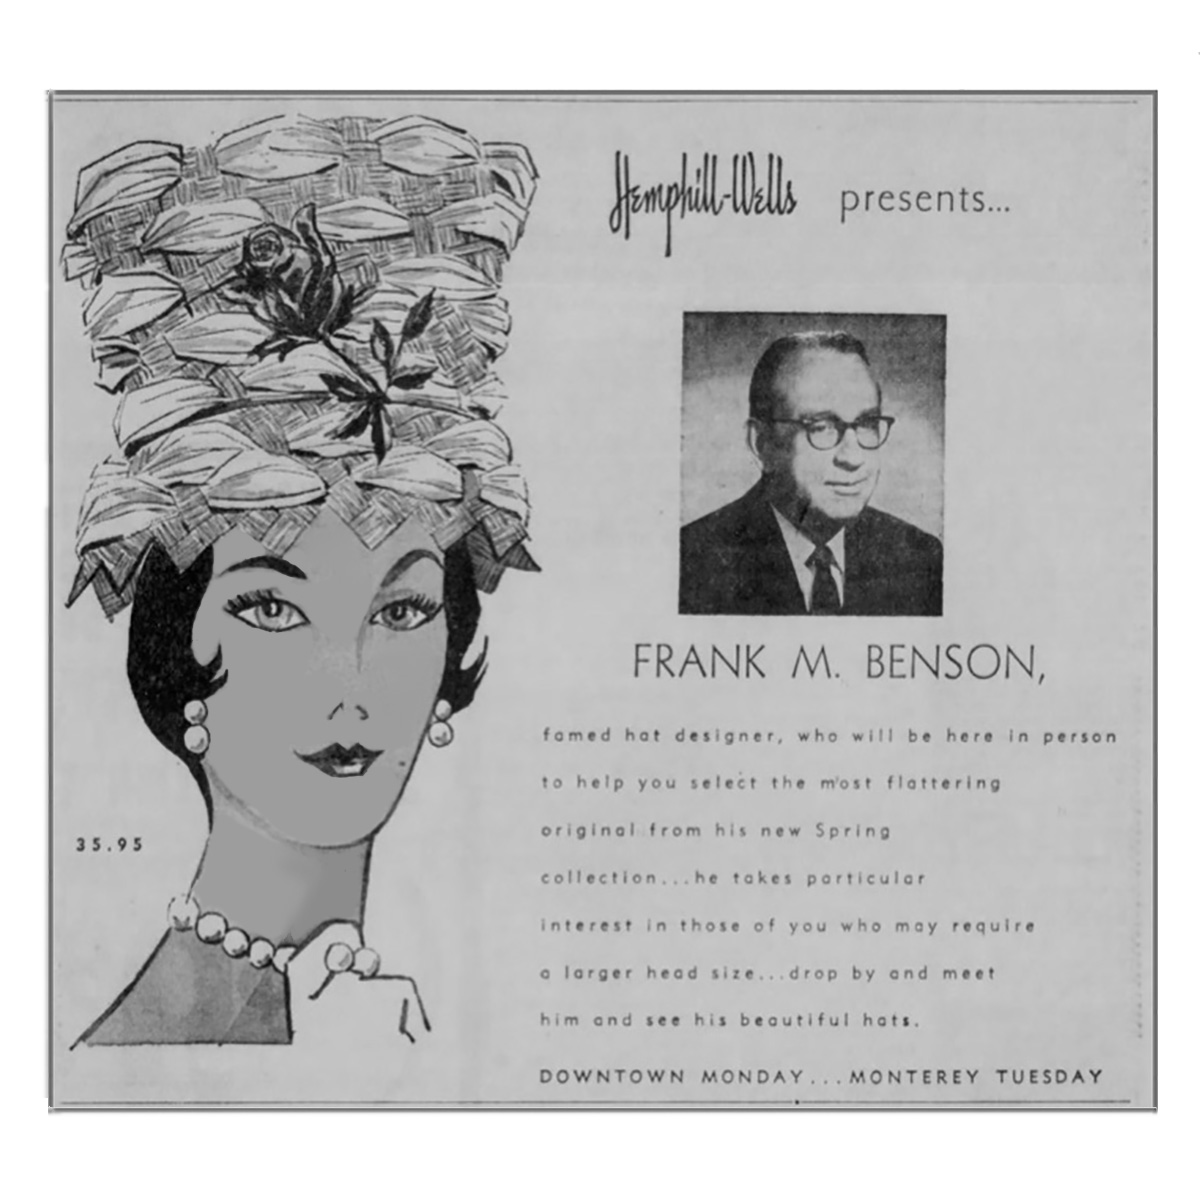 Frank M Benson advertisement 1960s